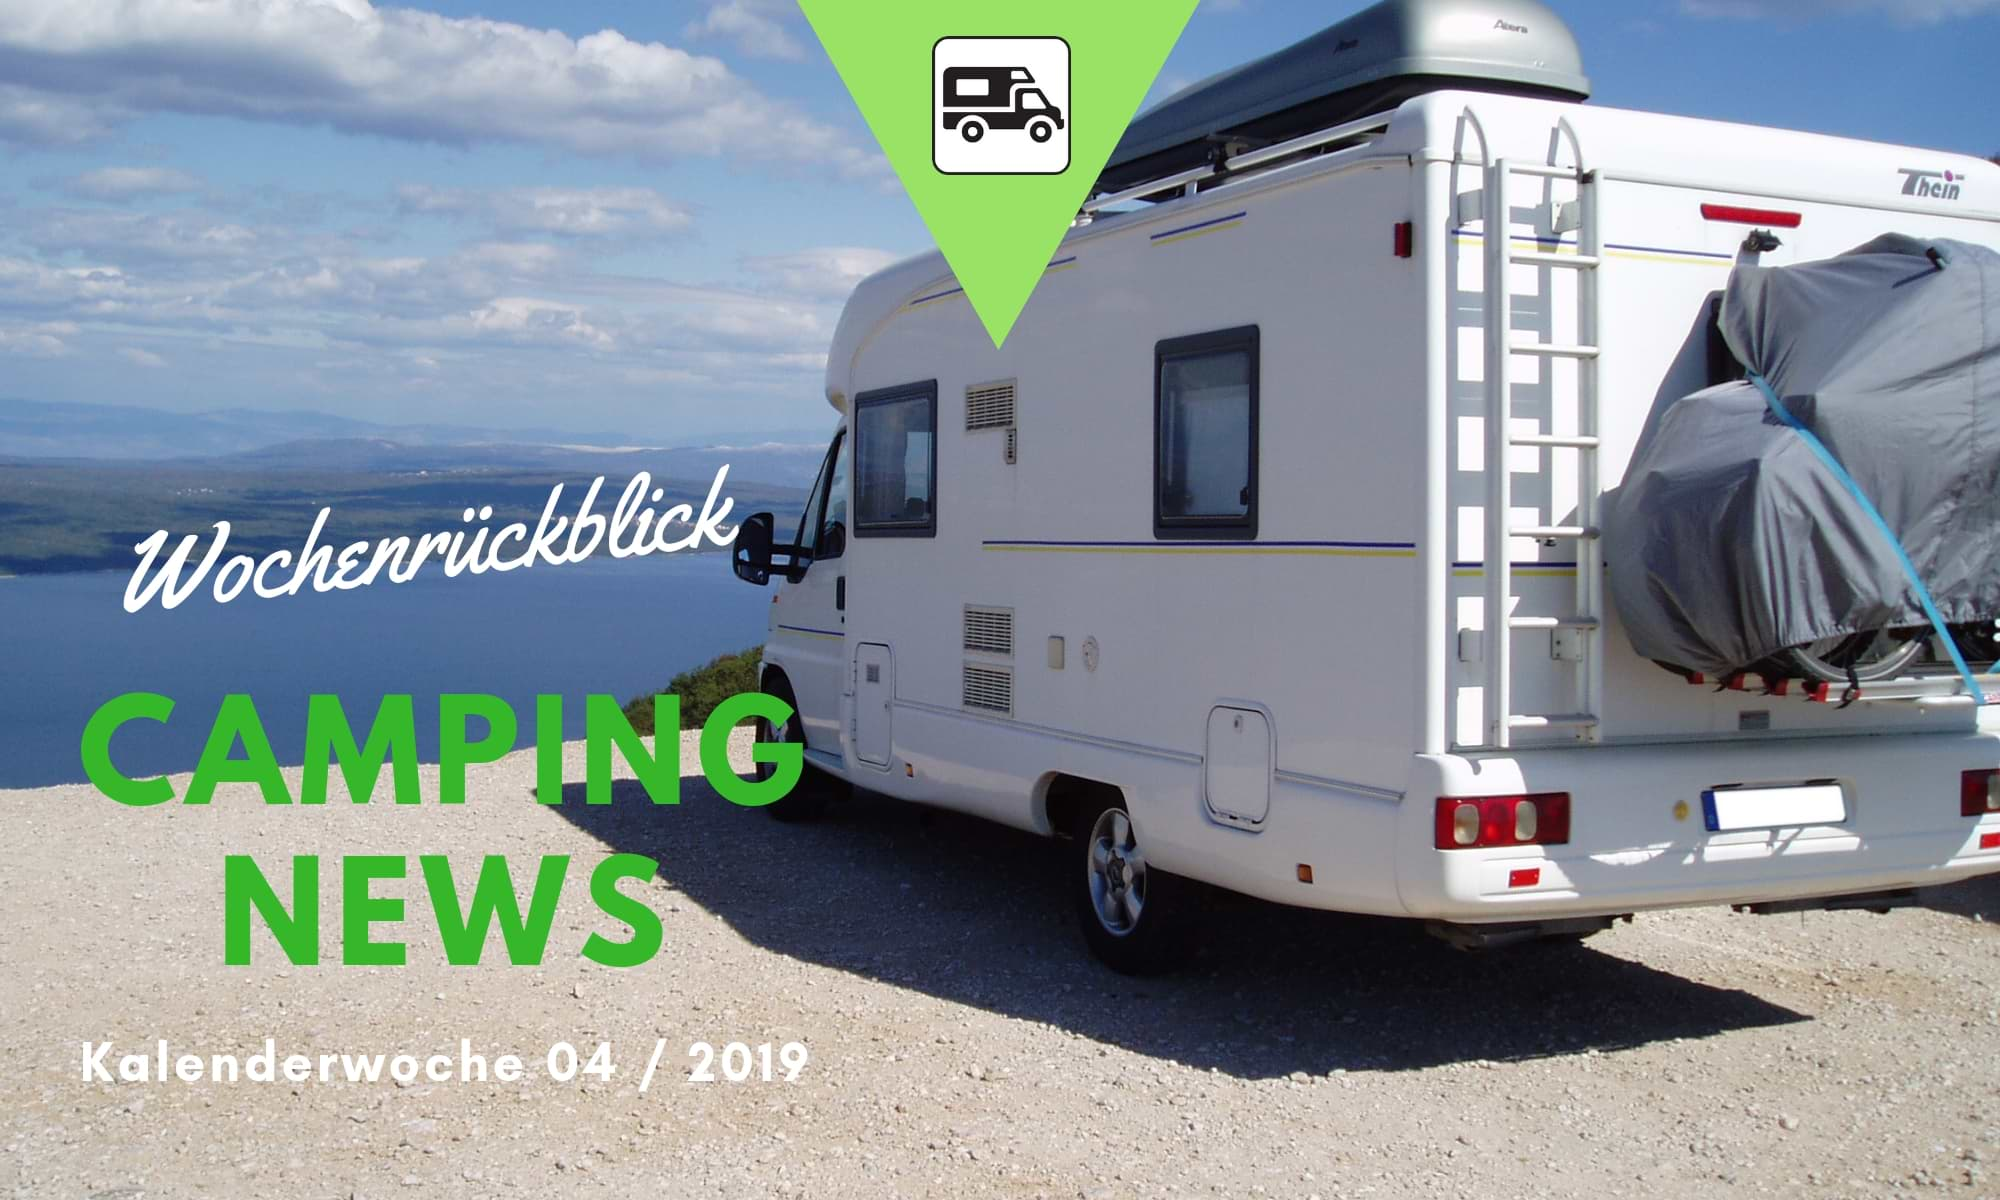 Wochenrückblick Camping News KW04-2019